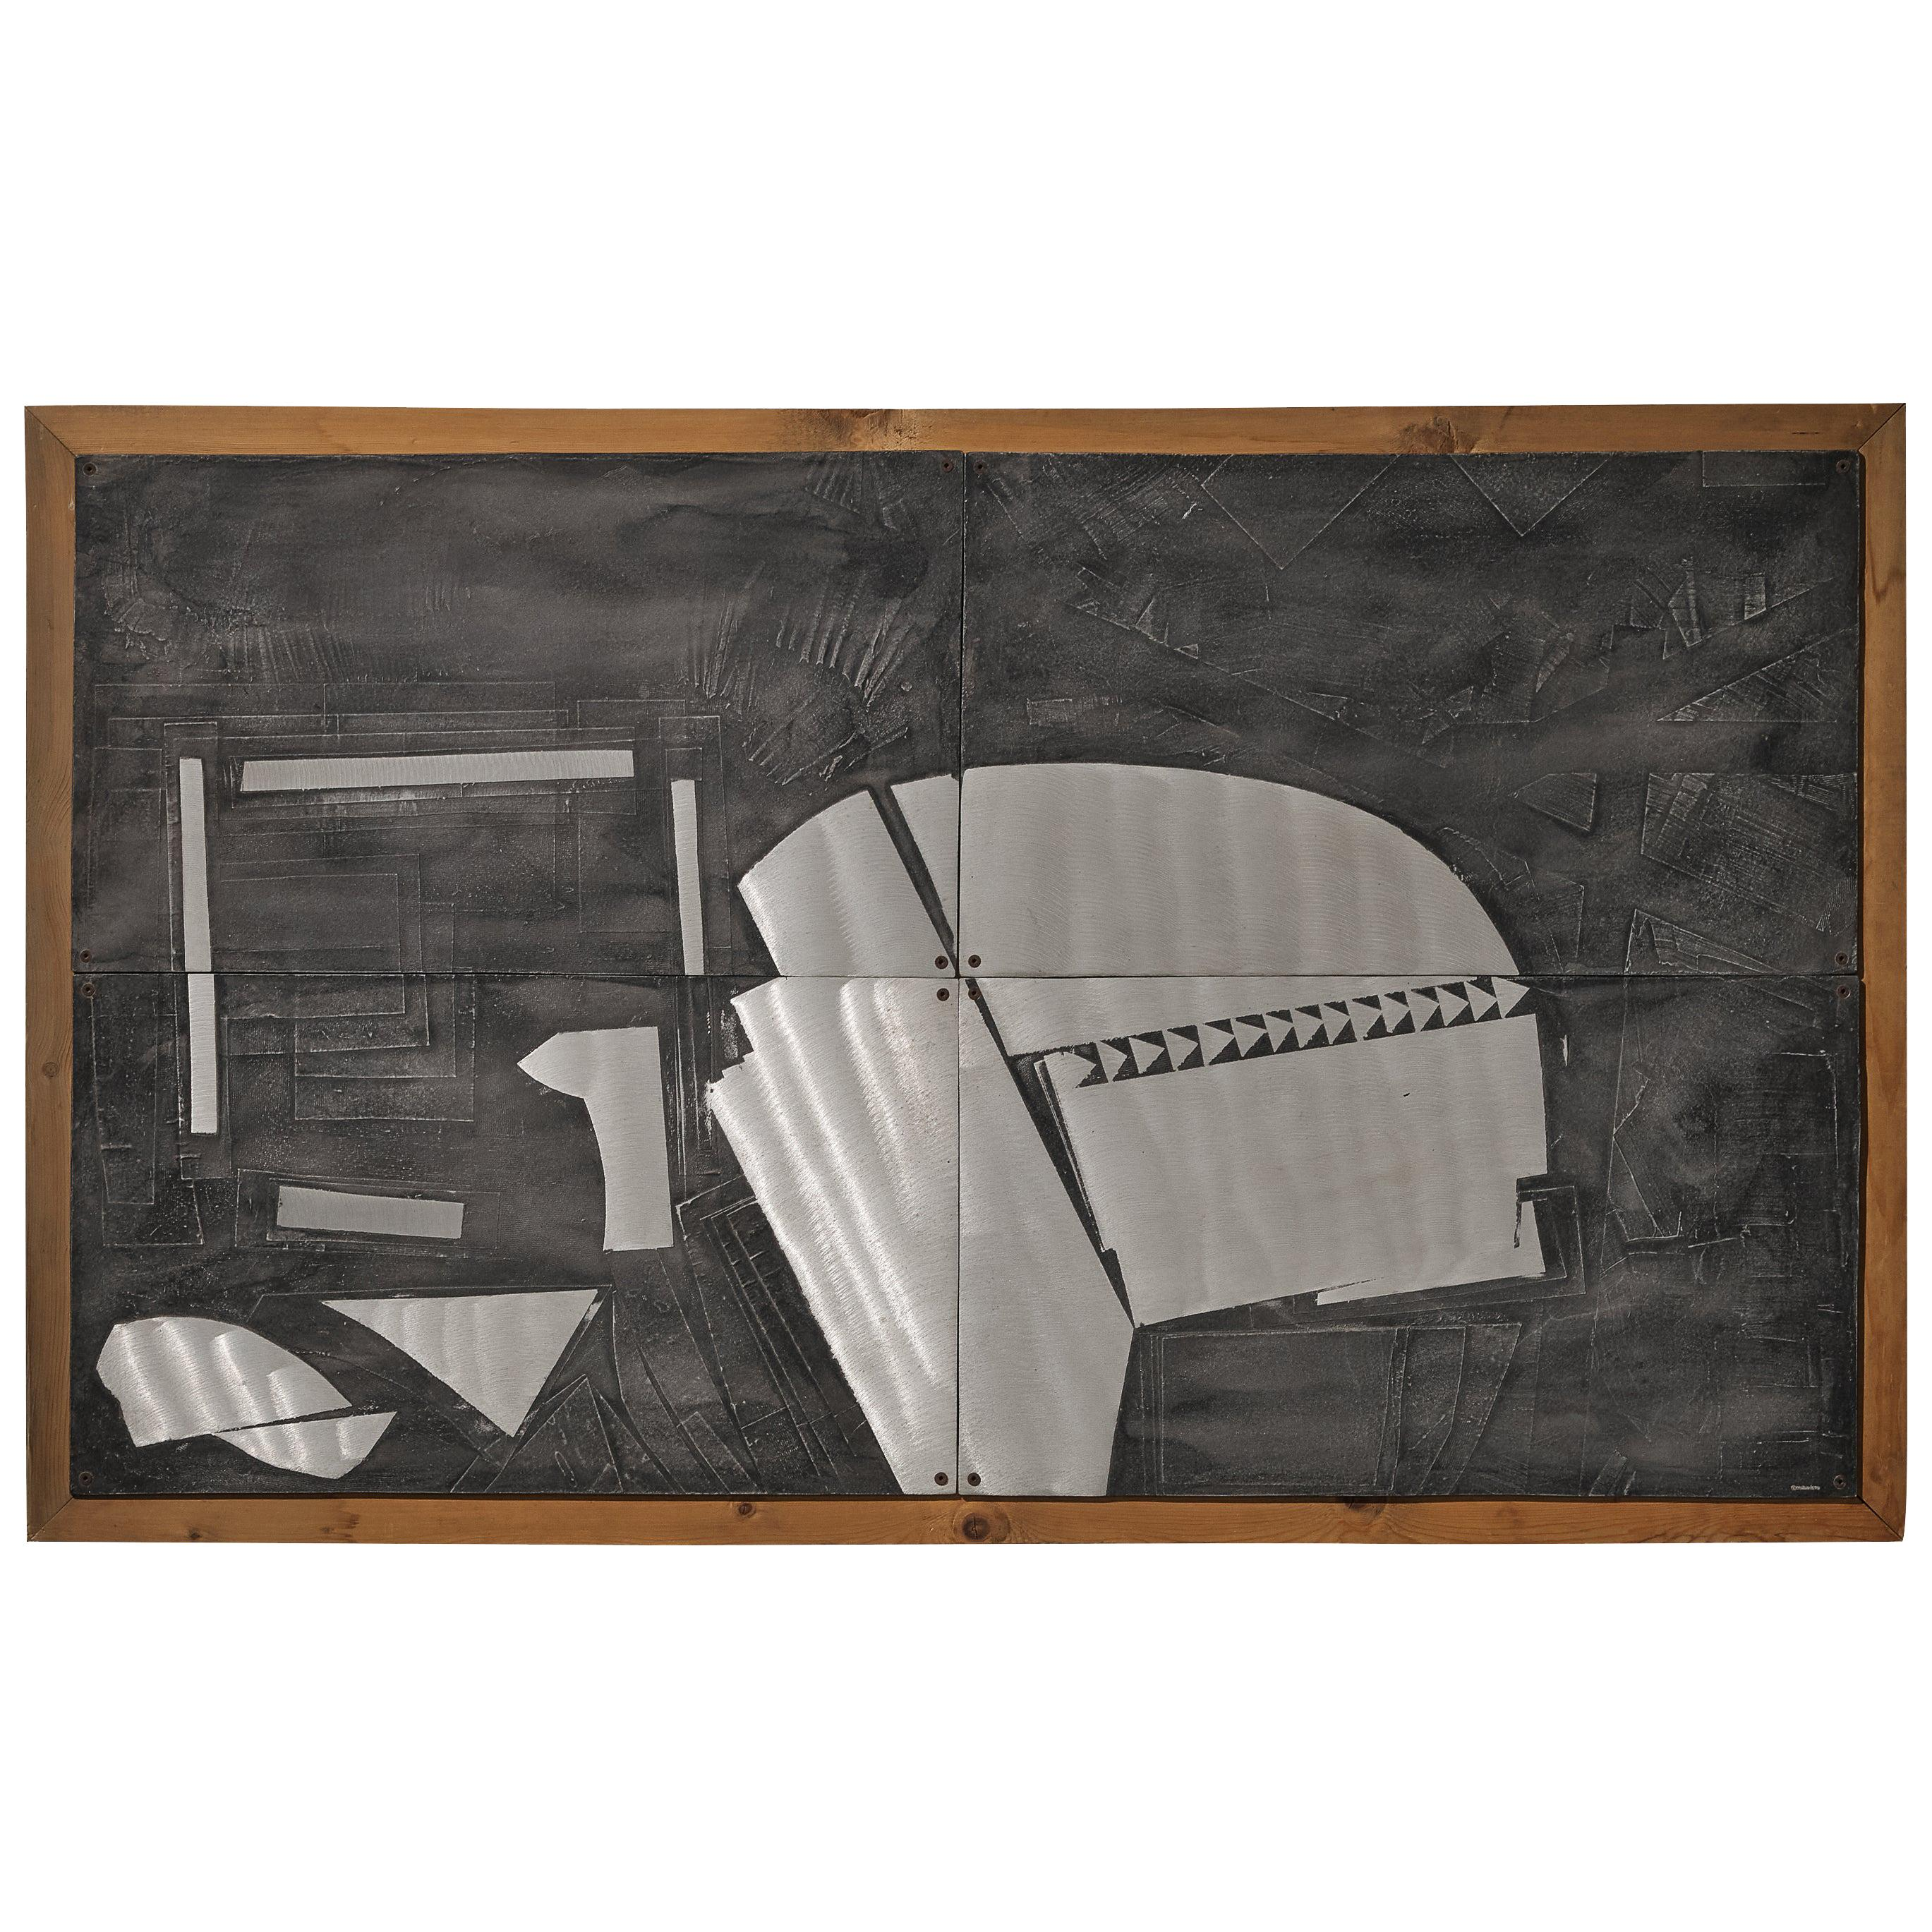 Lorenzo Burchiellaro Abstract Wall Panel in Aluminum and Wood